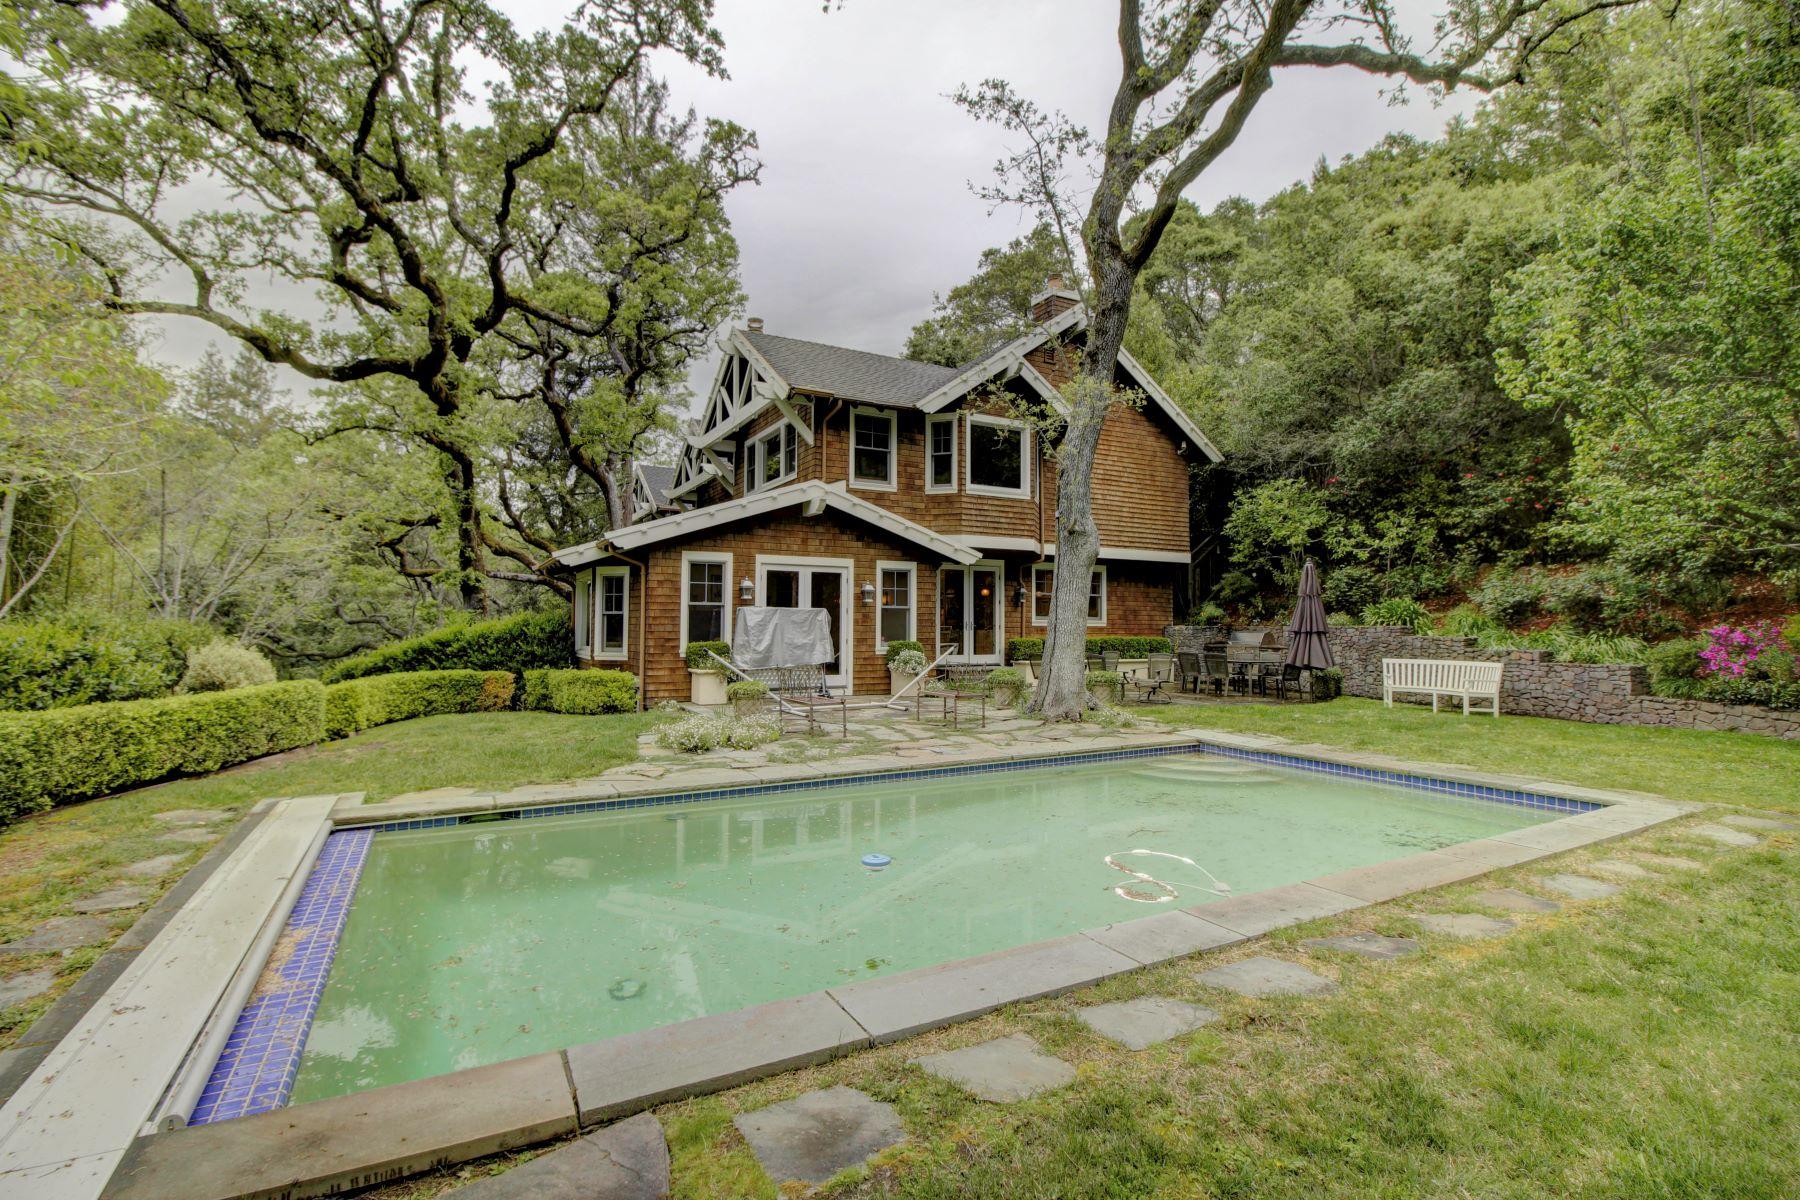 獨棟家庭住宅 為 出售 在 Jim Kelly Built Craftsman in the Flats of Kent Woodlands 45 Evergreen Drive Kentfield, 加利福尼亞州 94904 美國